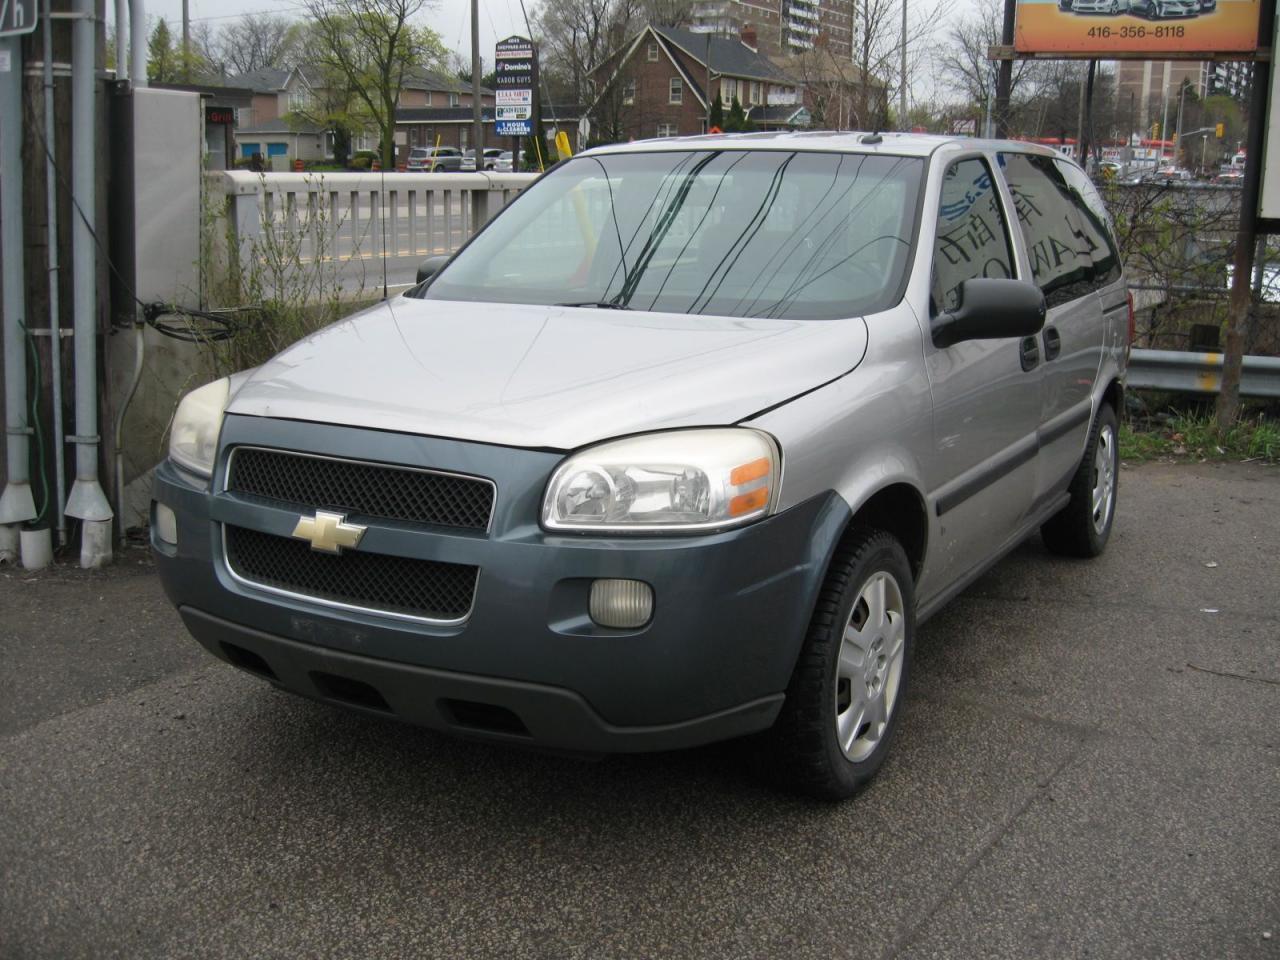 Photo of Silver 2007 Chevrolet Uplander